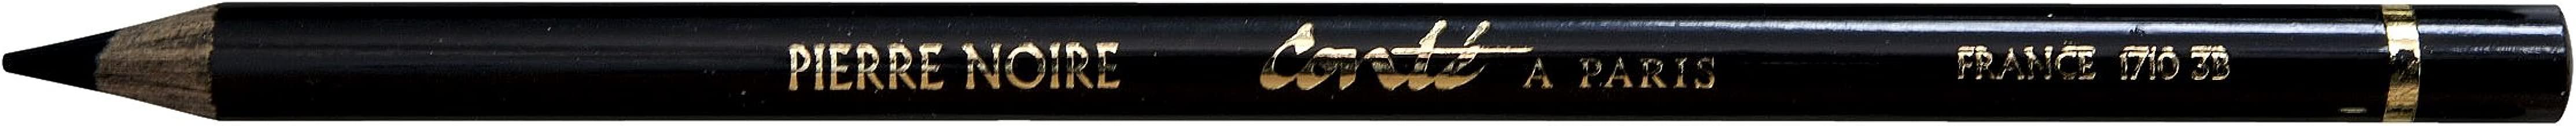 conte pierre noire pencils